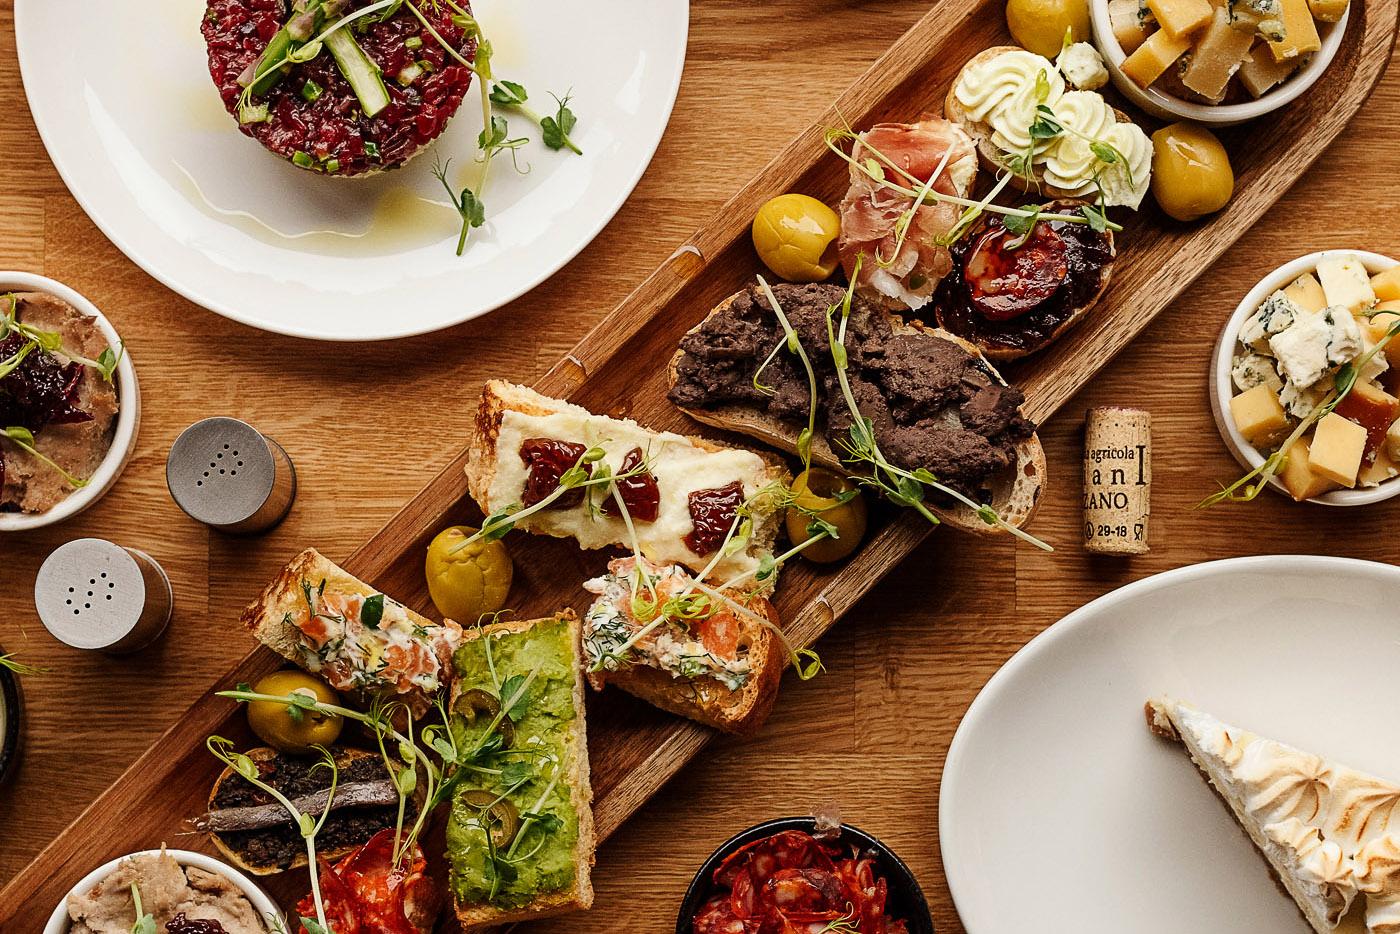 food photography tapas on the table brno